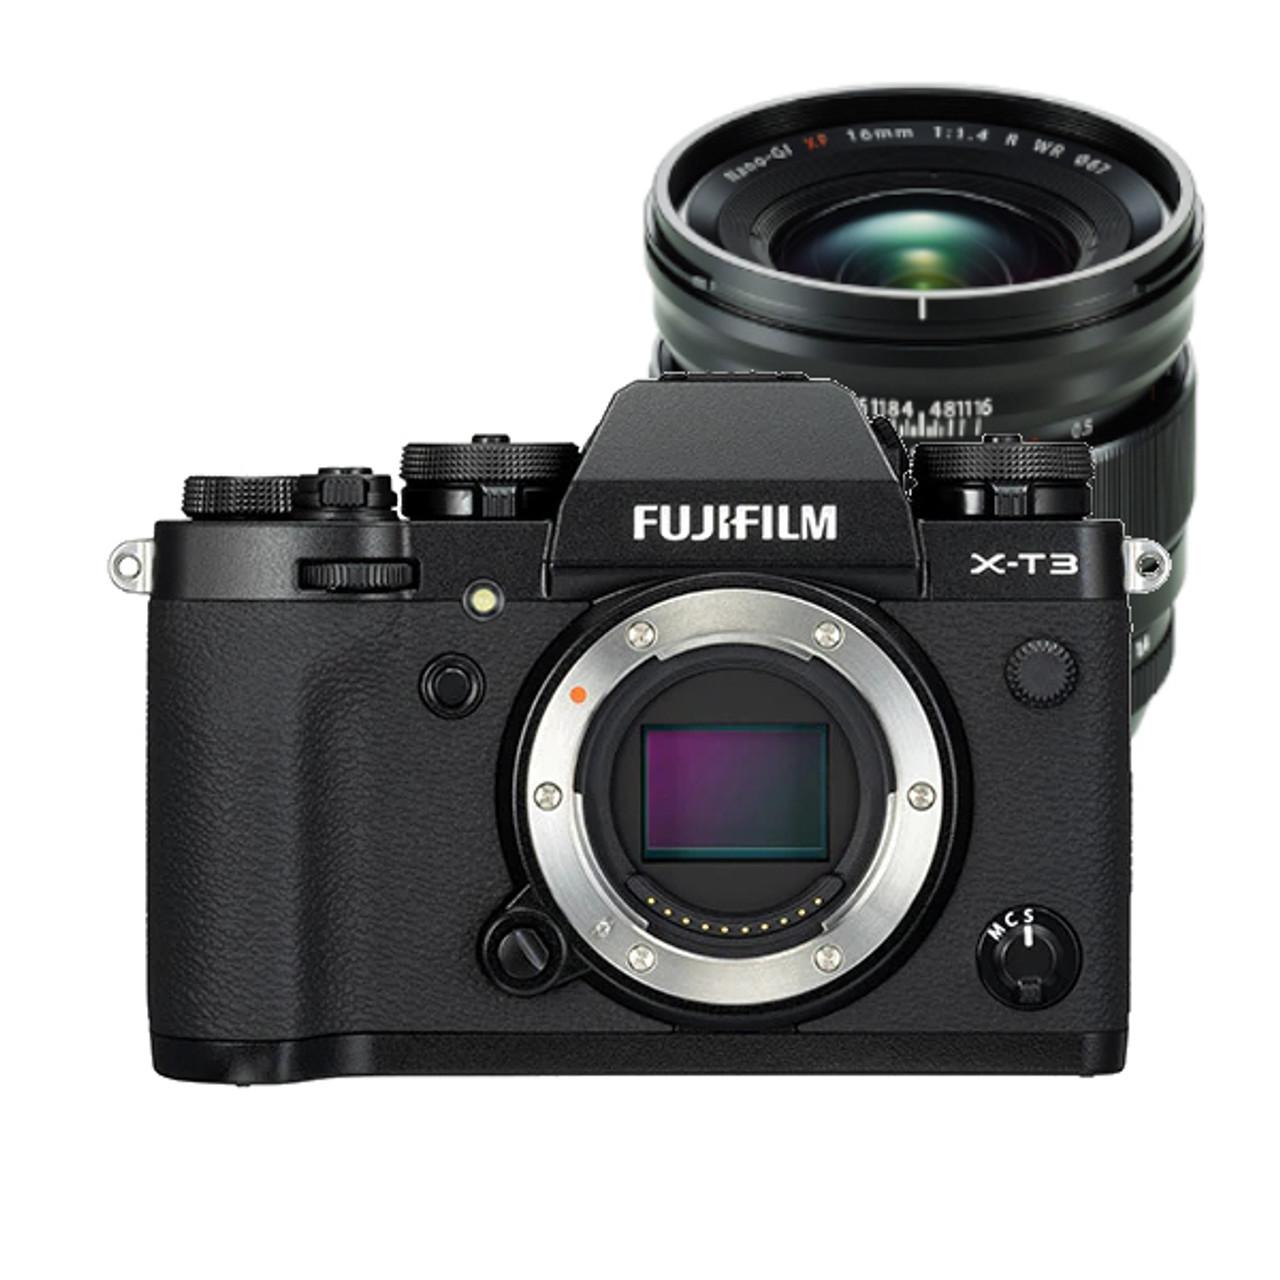 Fujifilm X-T3 Body (Black) w/ XF 16mm f1.4